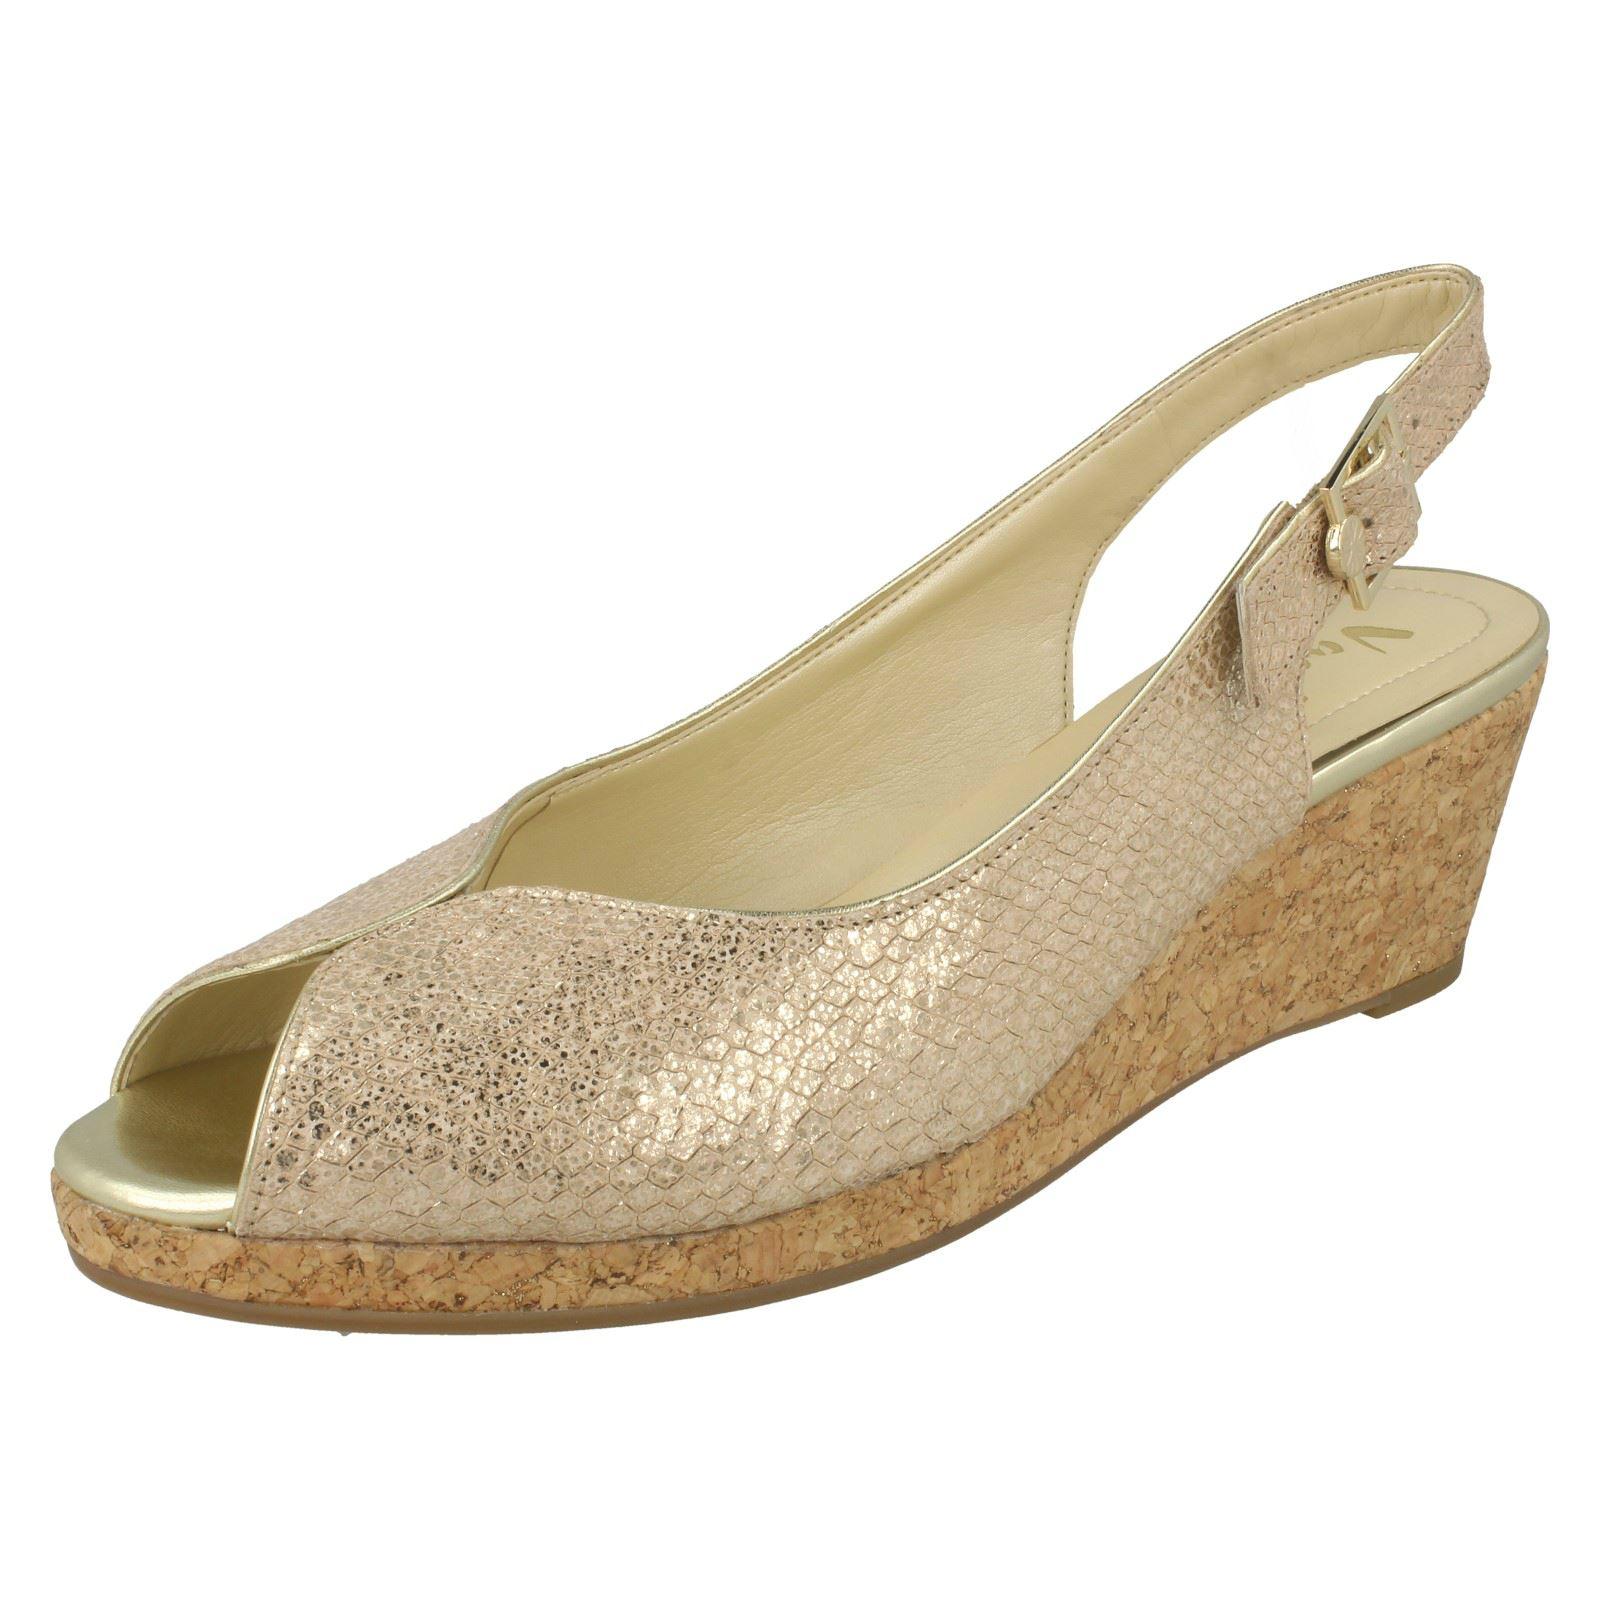 Ladies-Van-Dal-Cork-Wedge-Sandals-Gable thumbnail 9